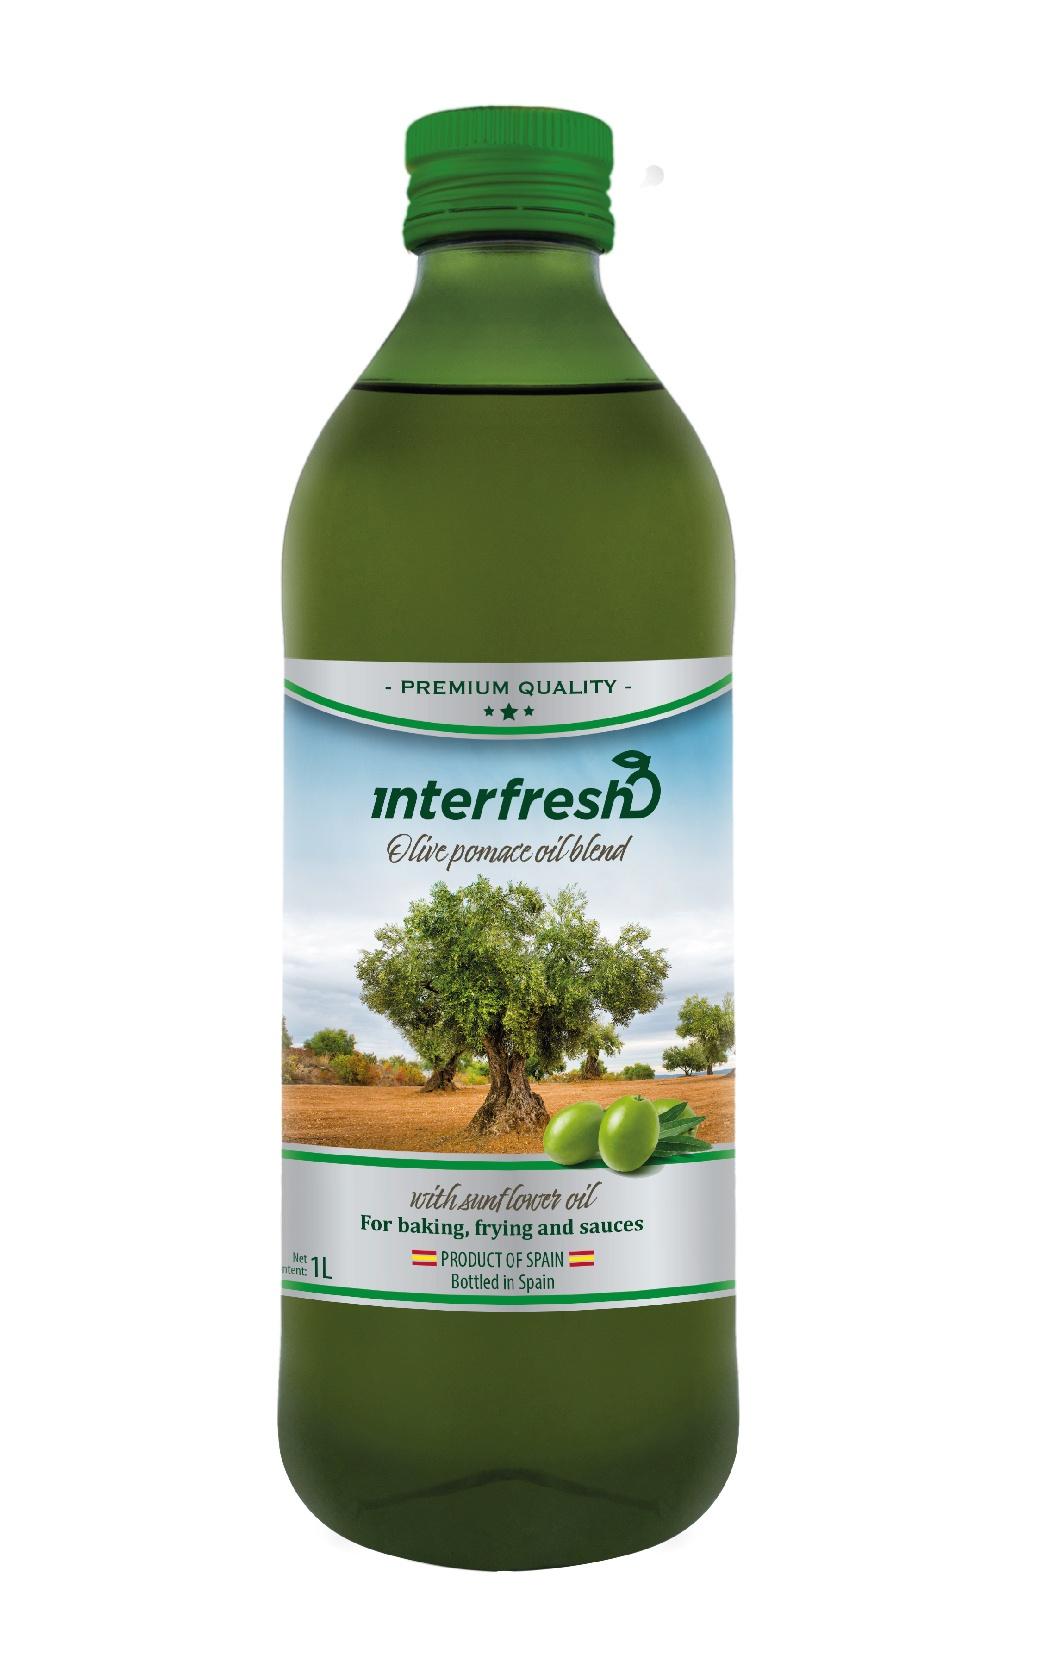 Оливковое масло INTERFRESH Масло оливковое, 1350 корзину для жарки во фритюре